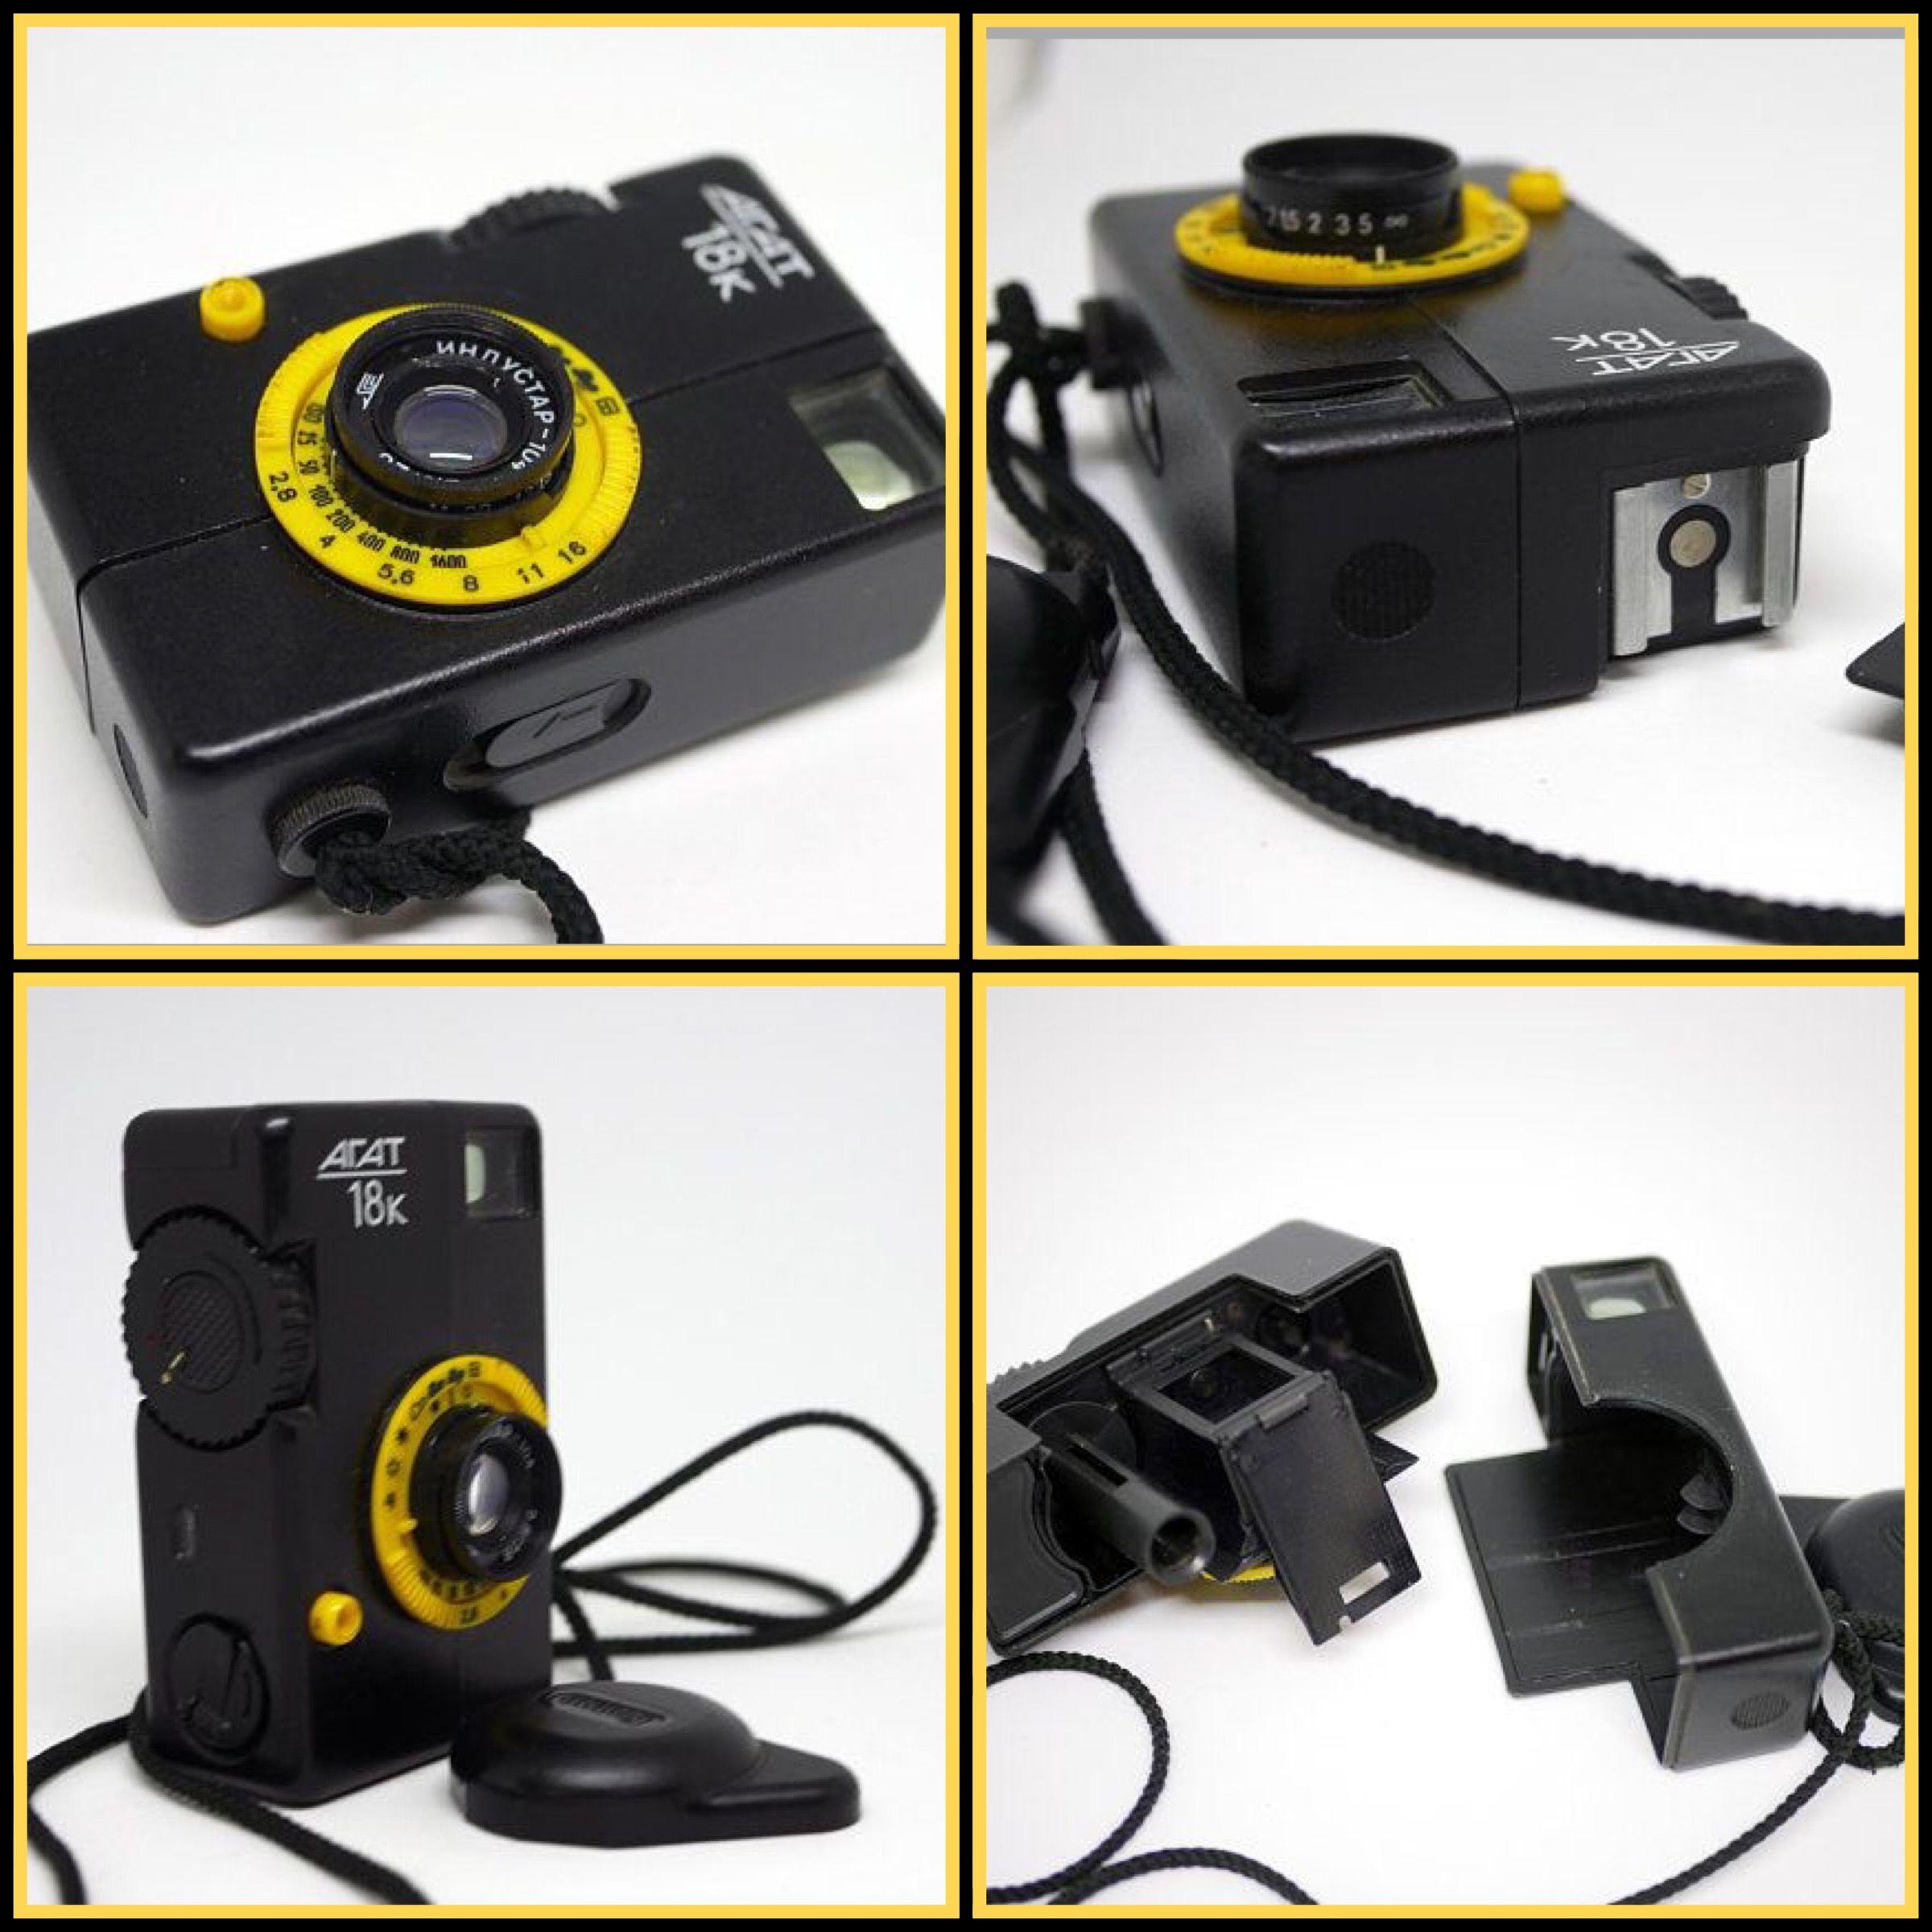 Agat-18K Camera,rare camera, collector's camera, vintage